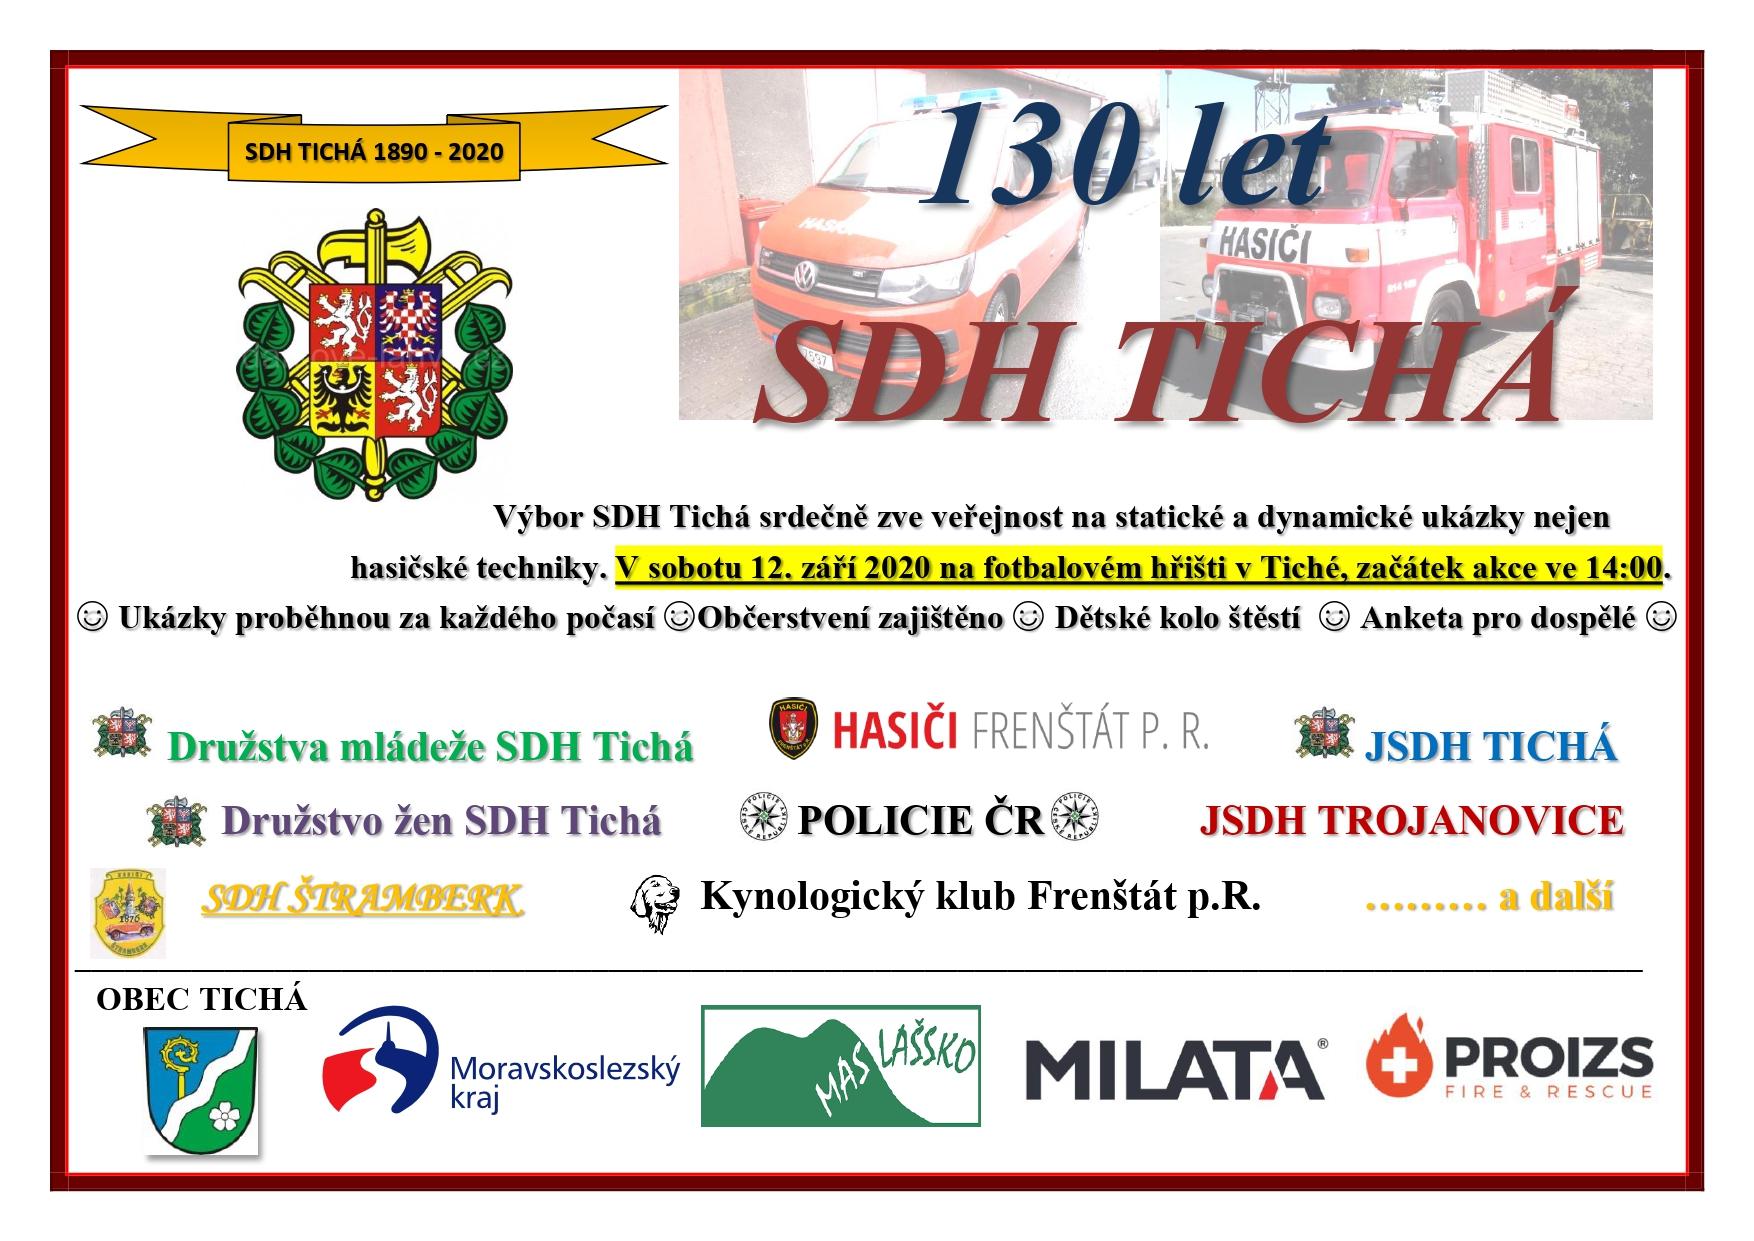 130 let SDH Tichá